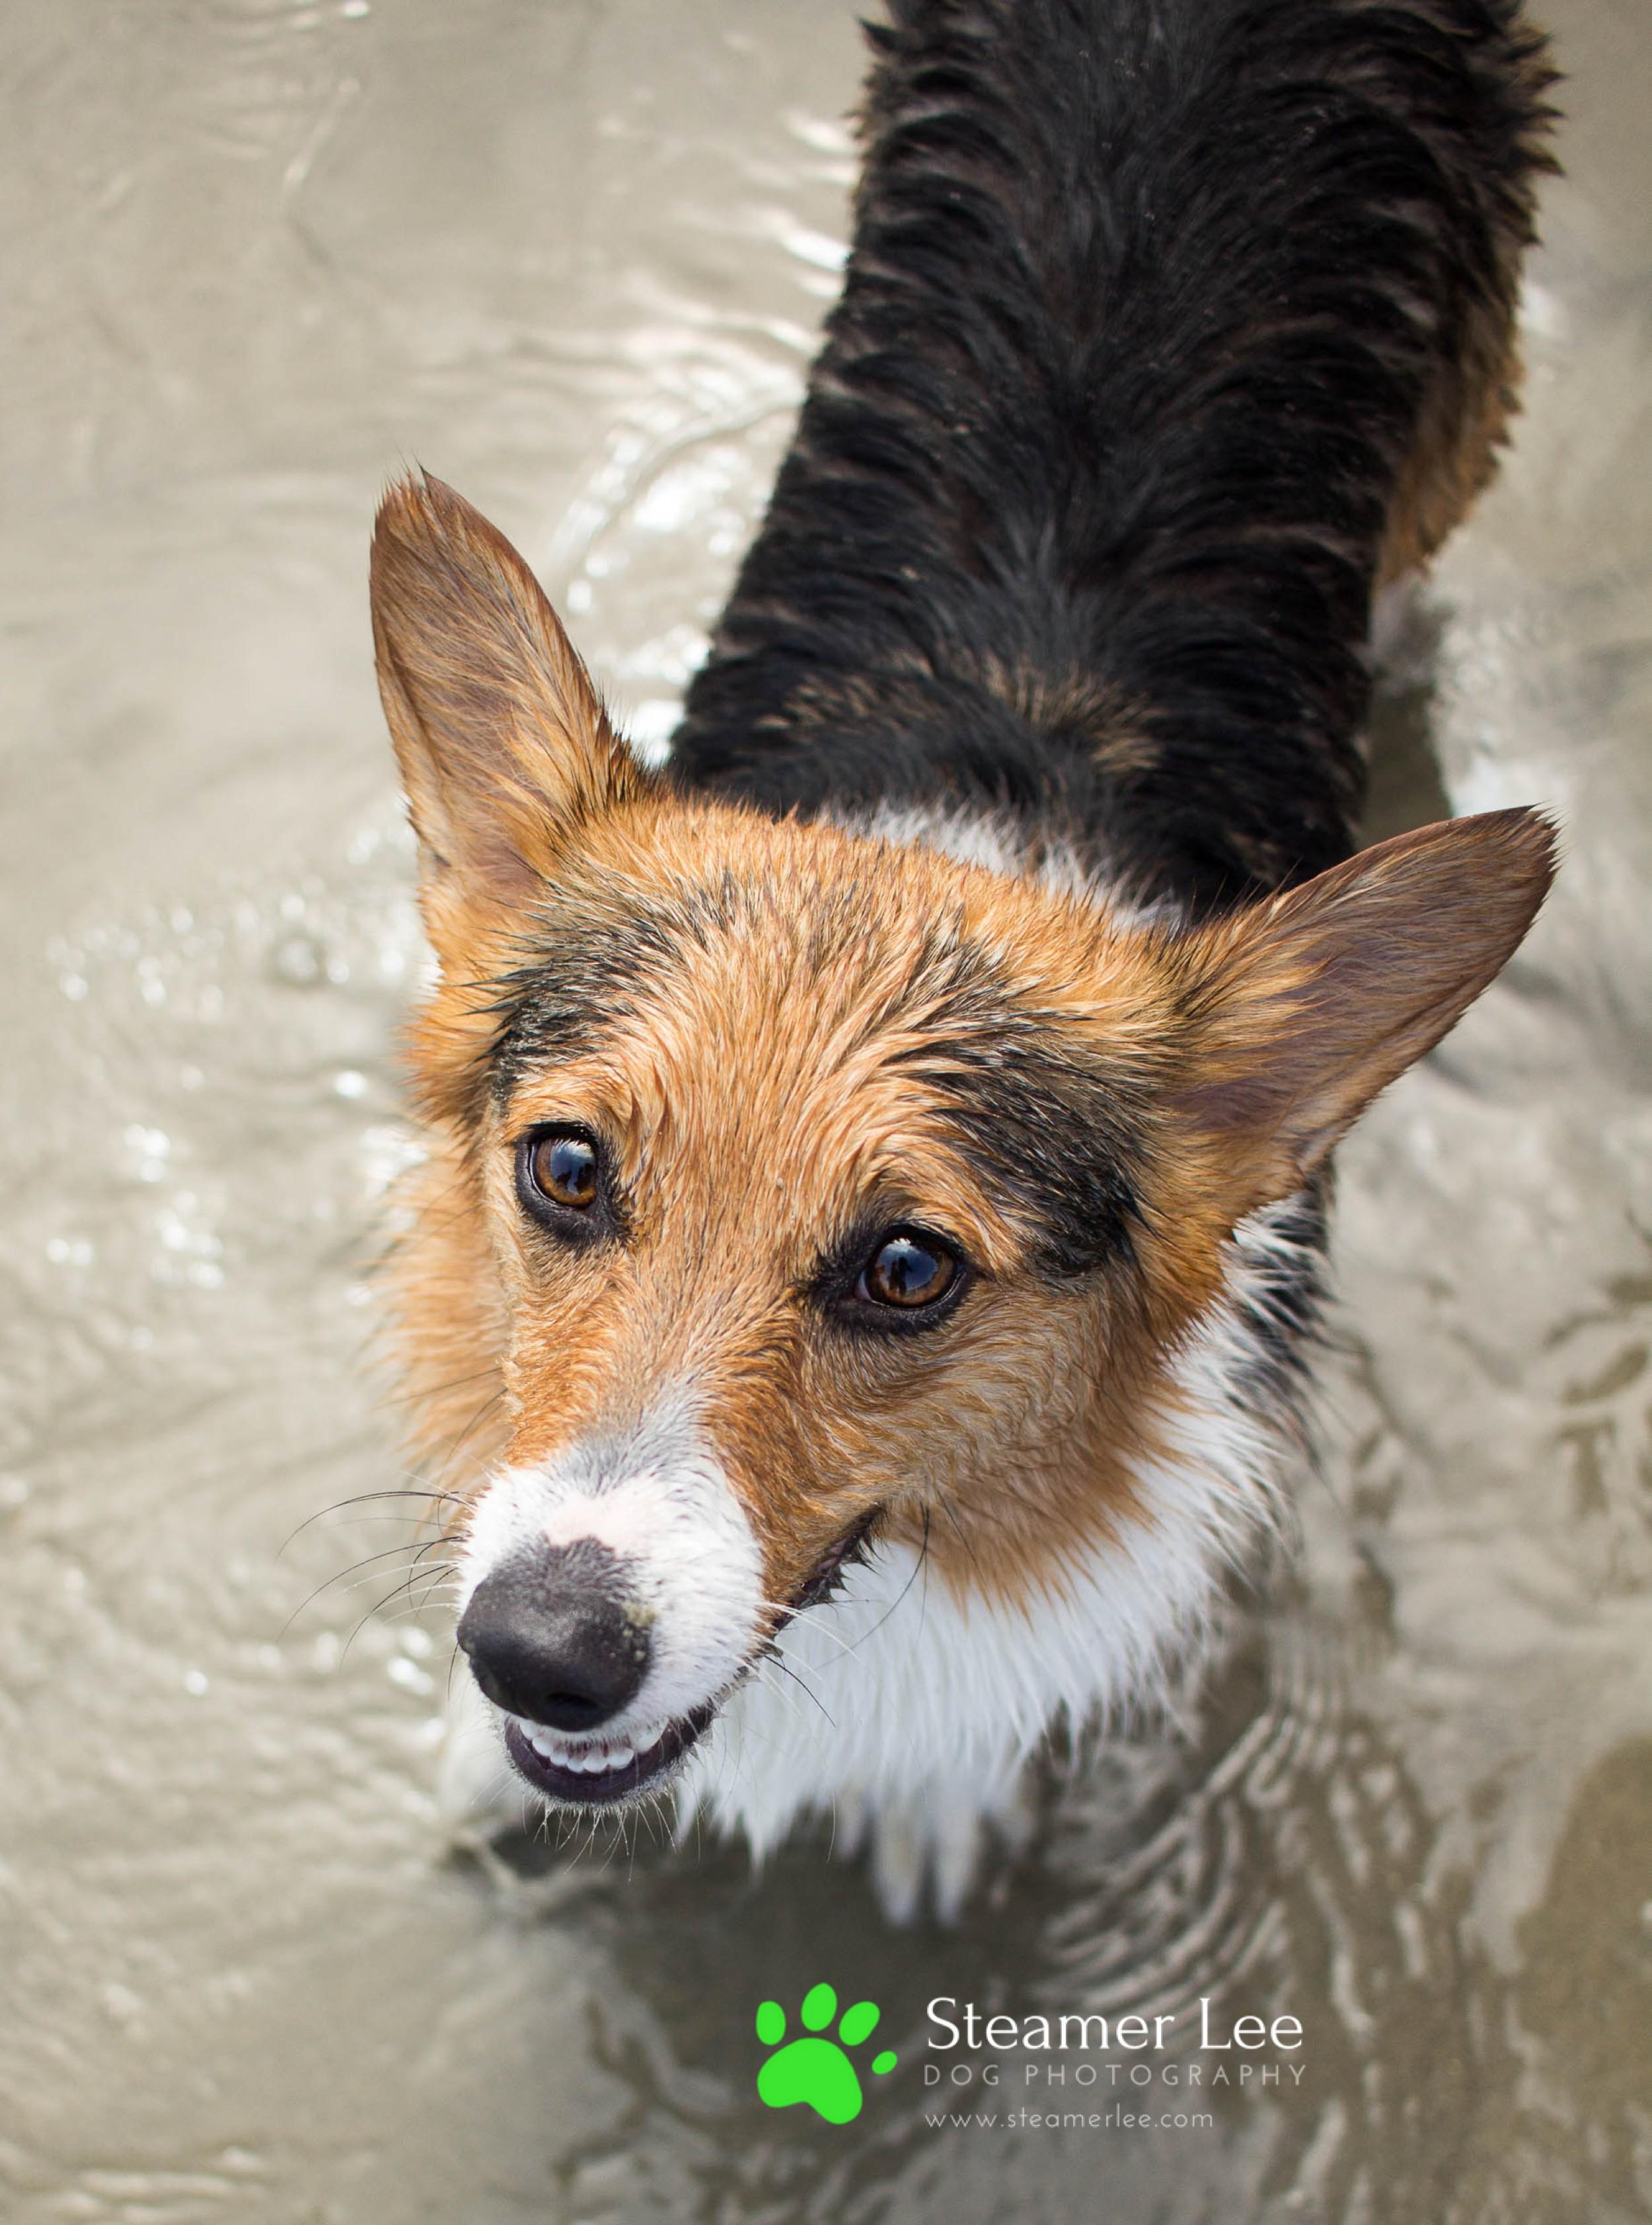 Steamer Lee Dog Photography - July 2017 So Cal Corgi Beach Day - Vol. 3 - 19.jpg